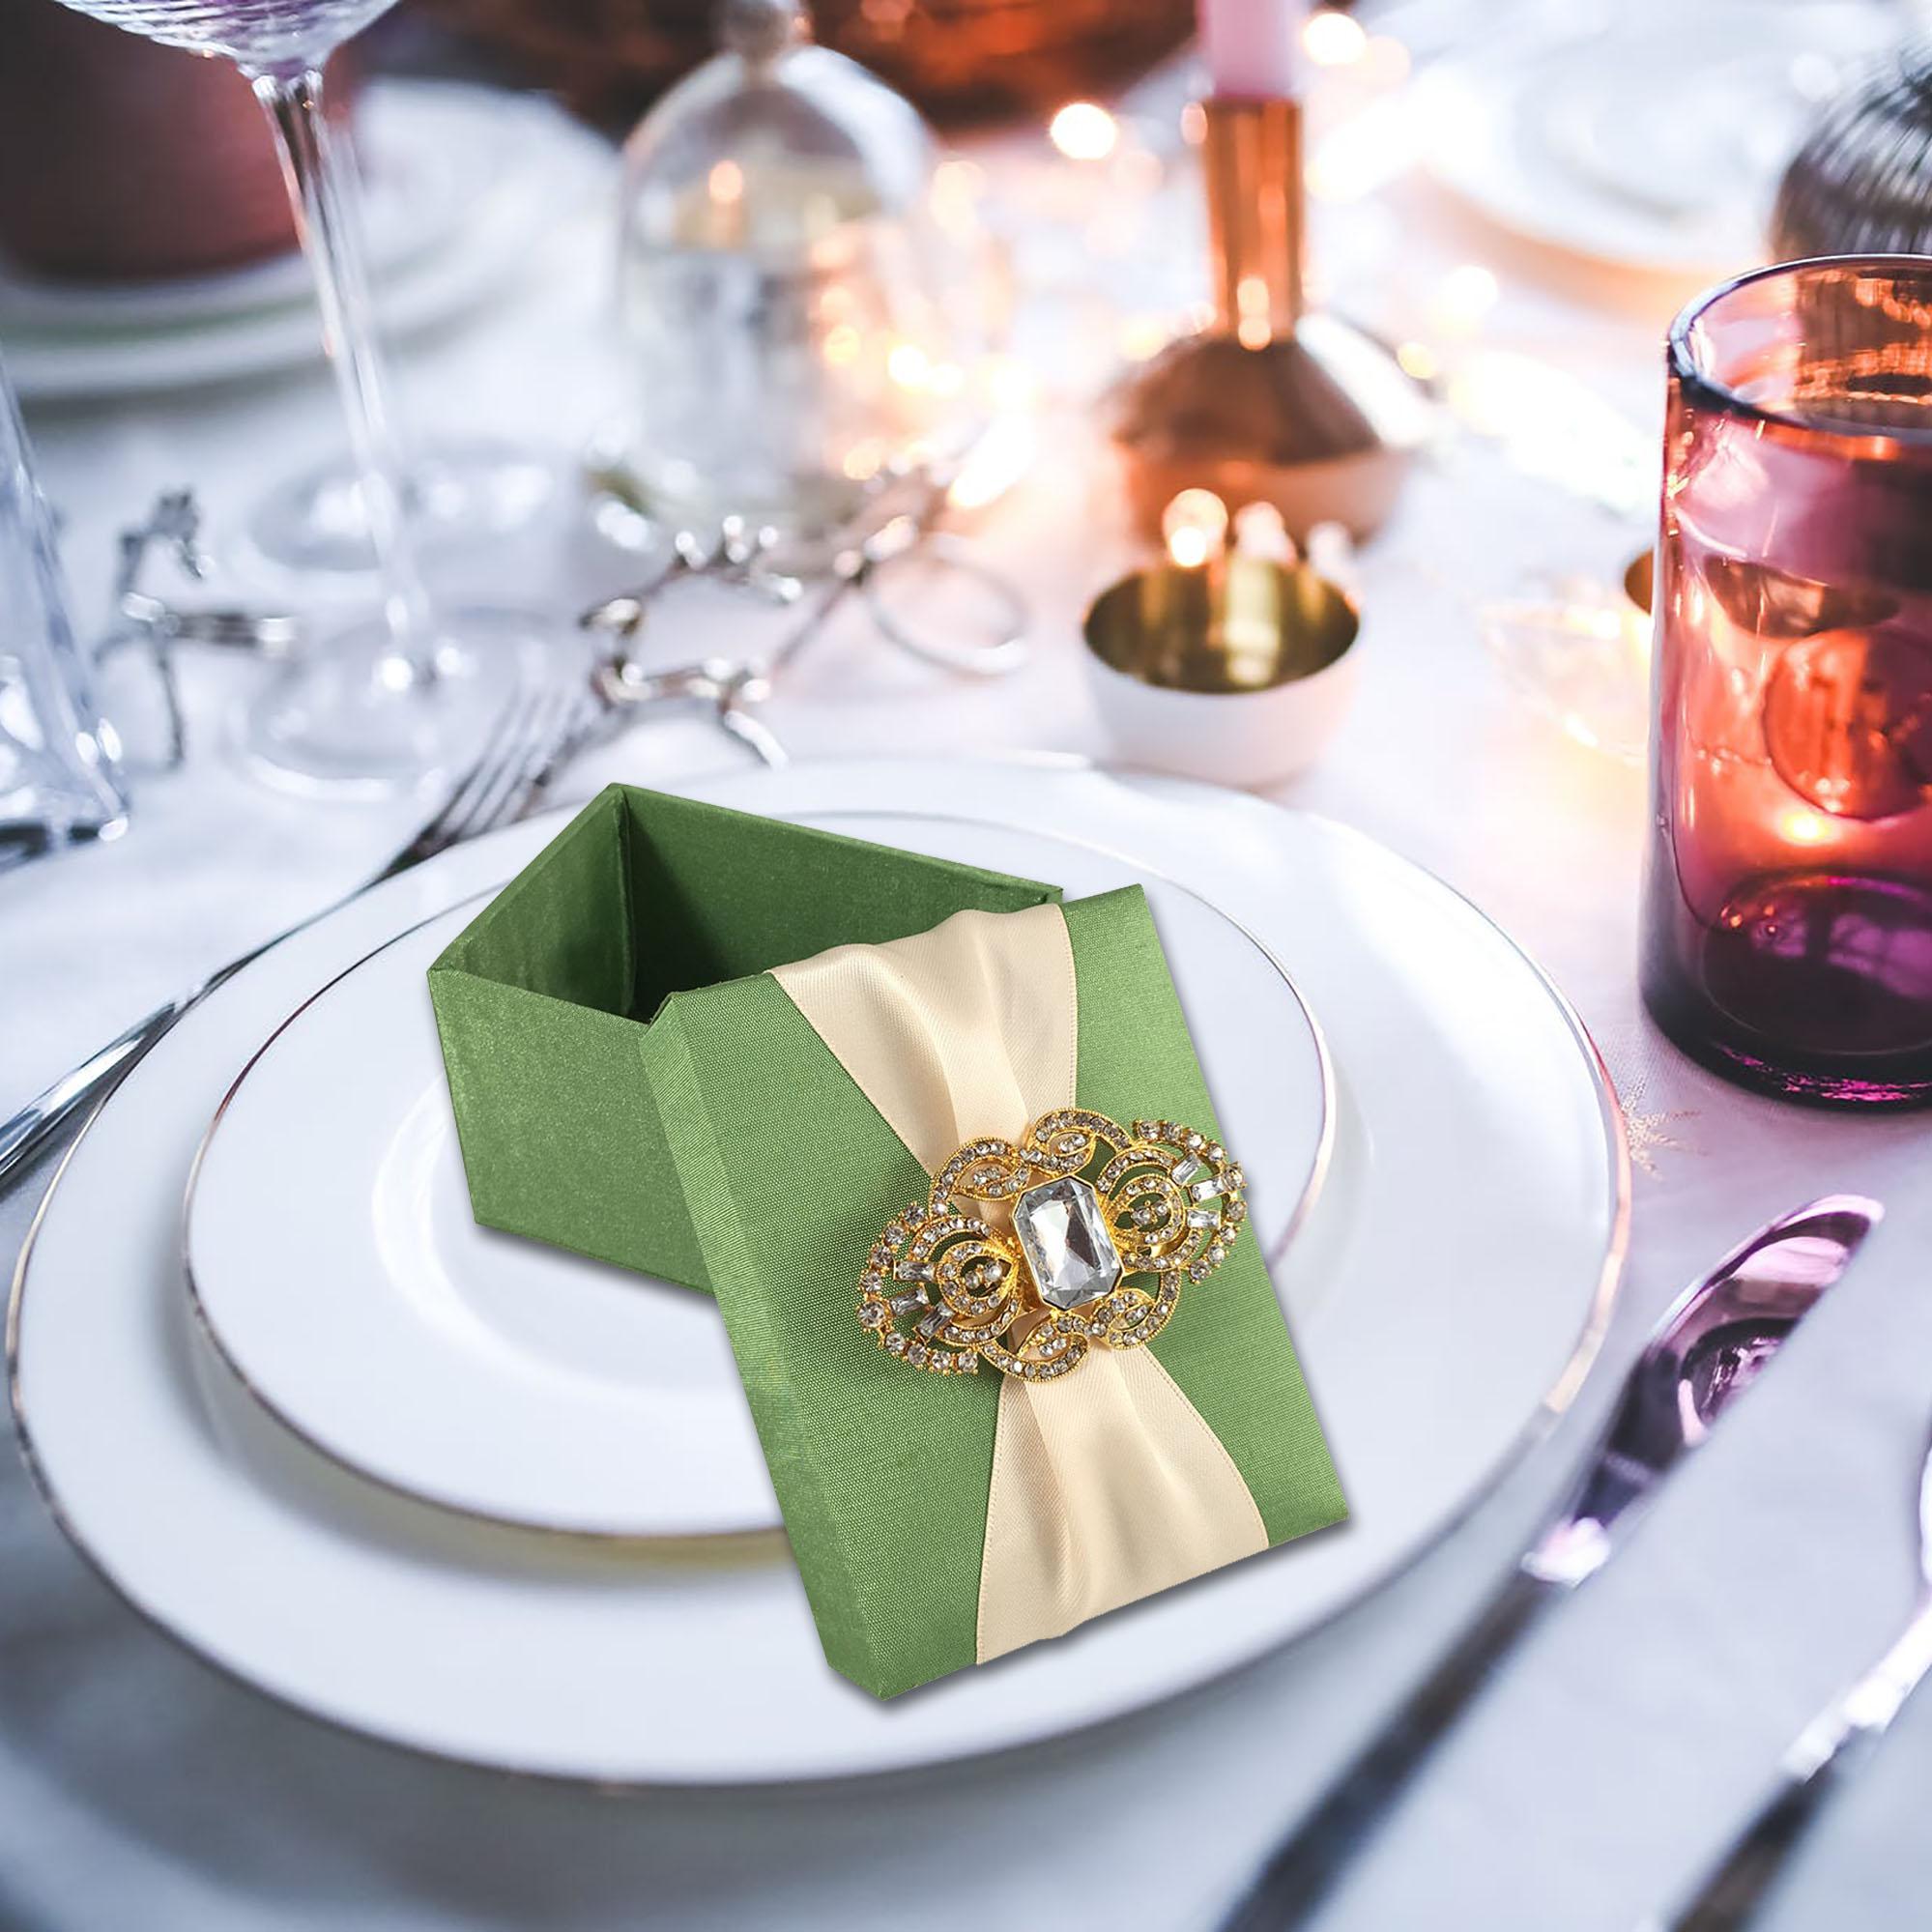 Presentation of green silk favor box on wedding table